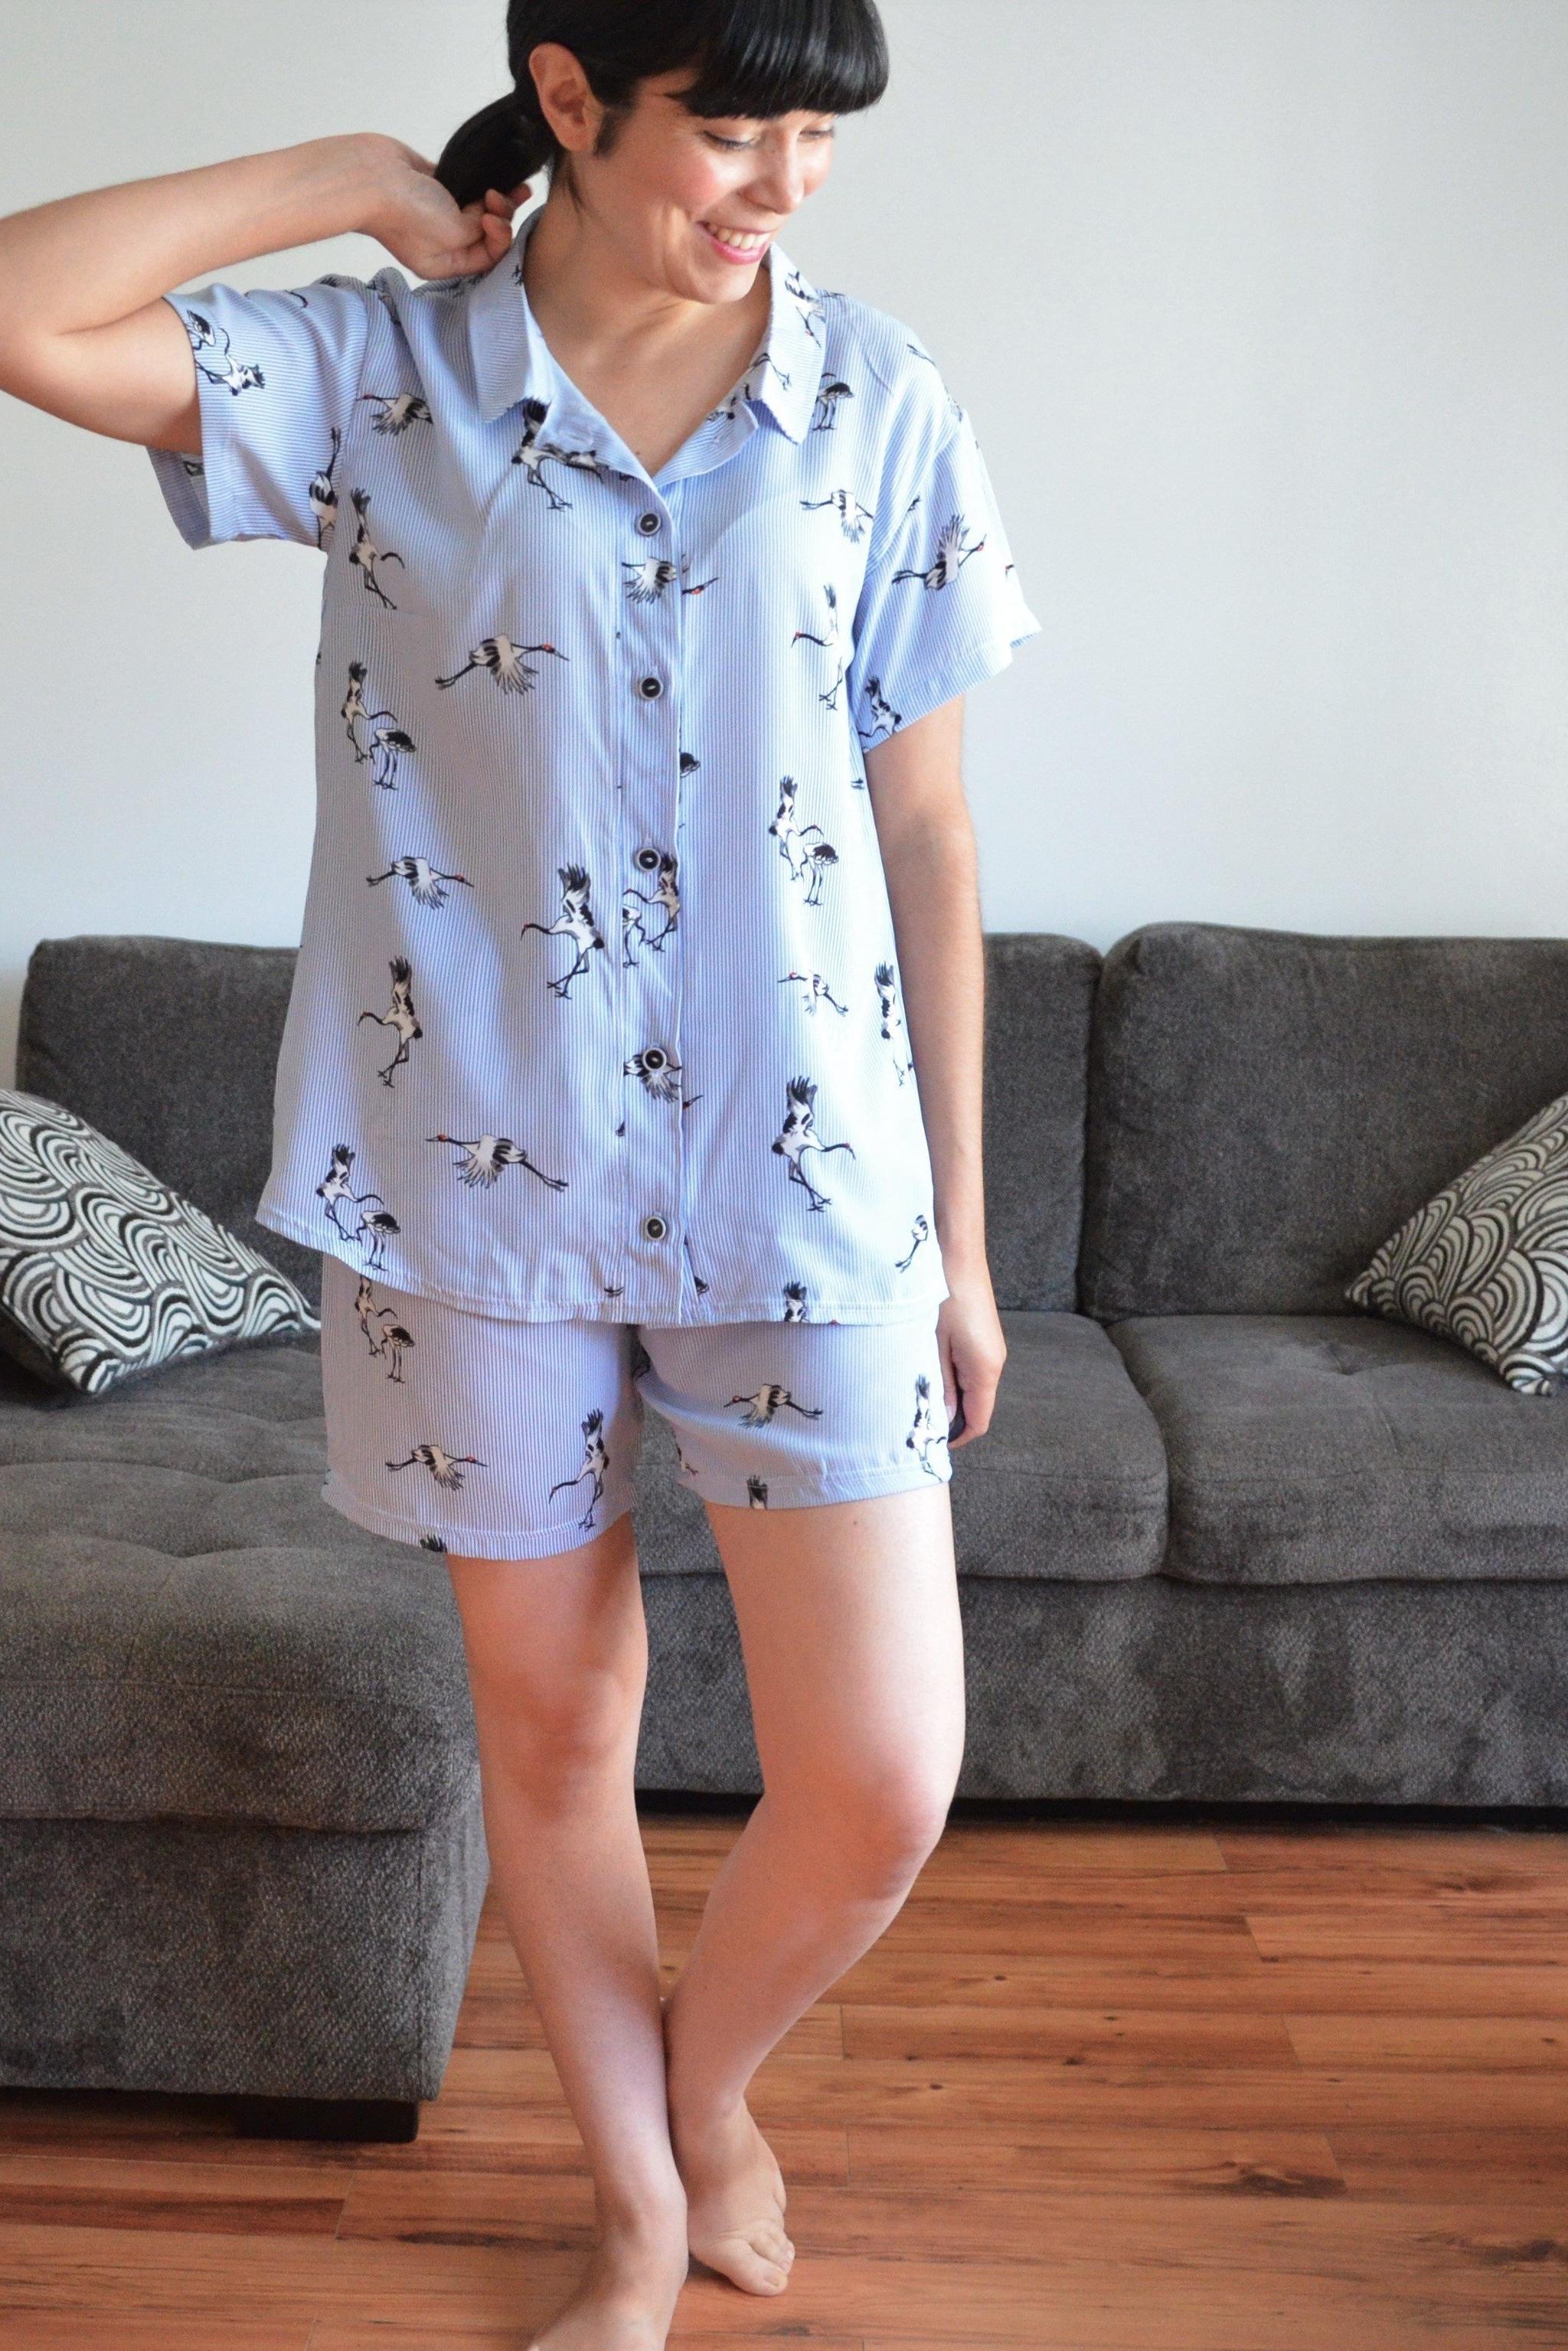 Adley Pajama Set sewing pattern from DG Patterns